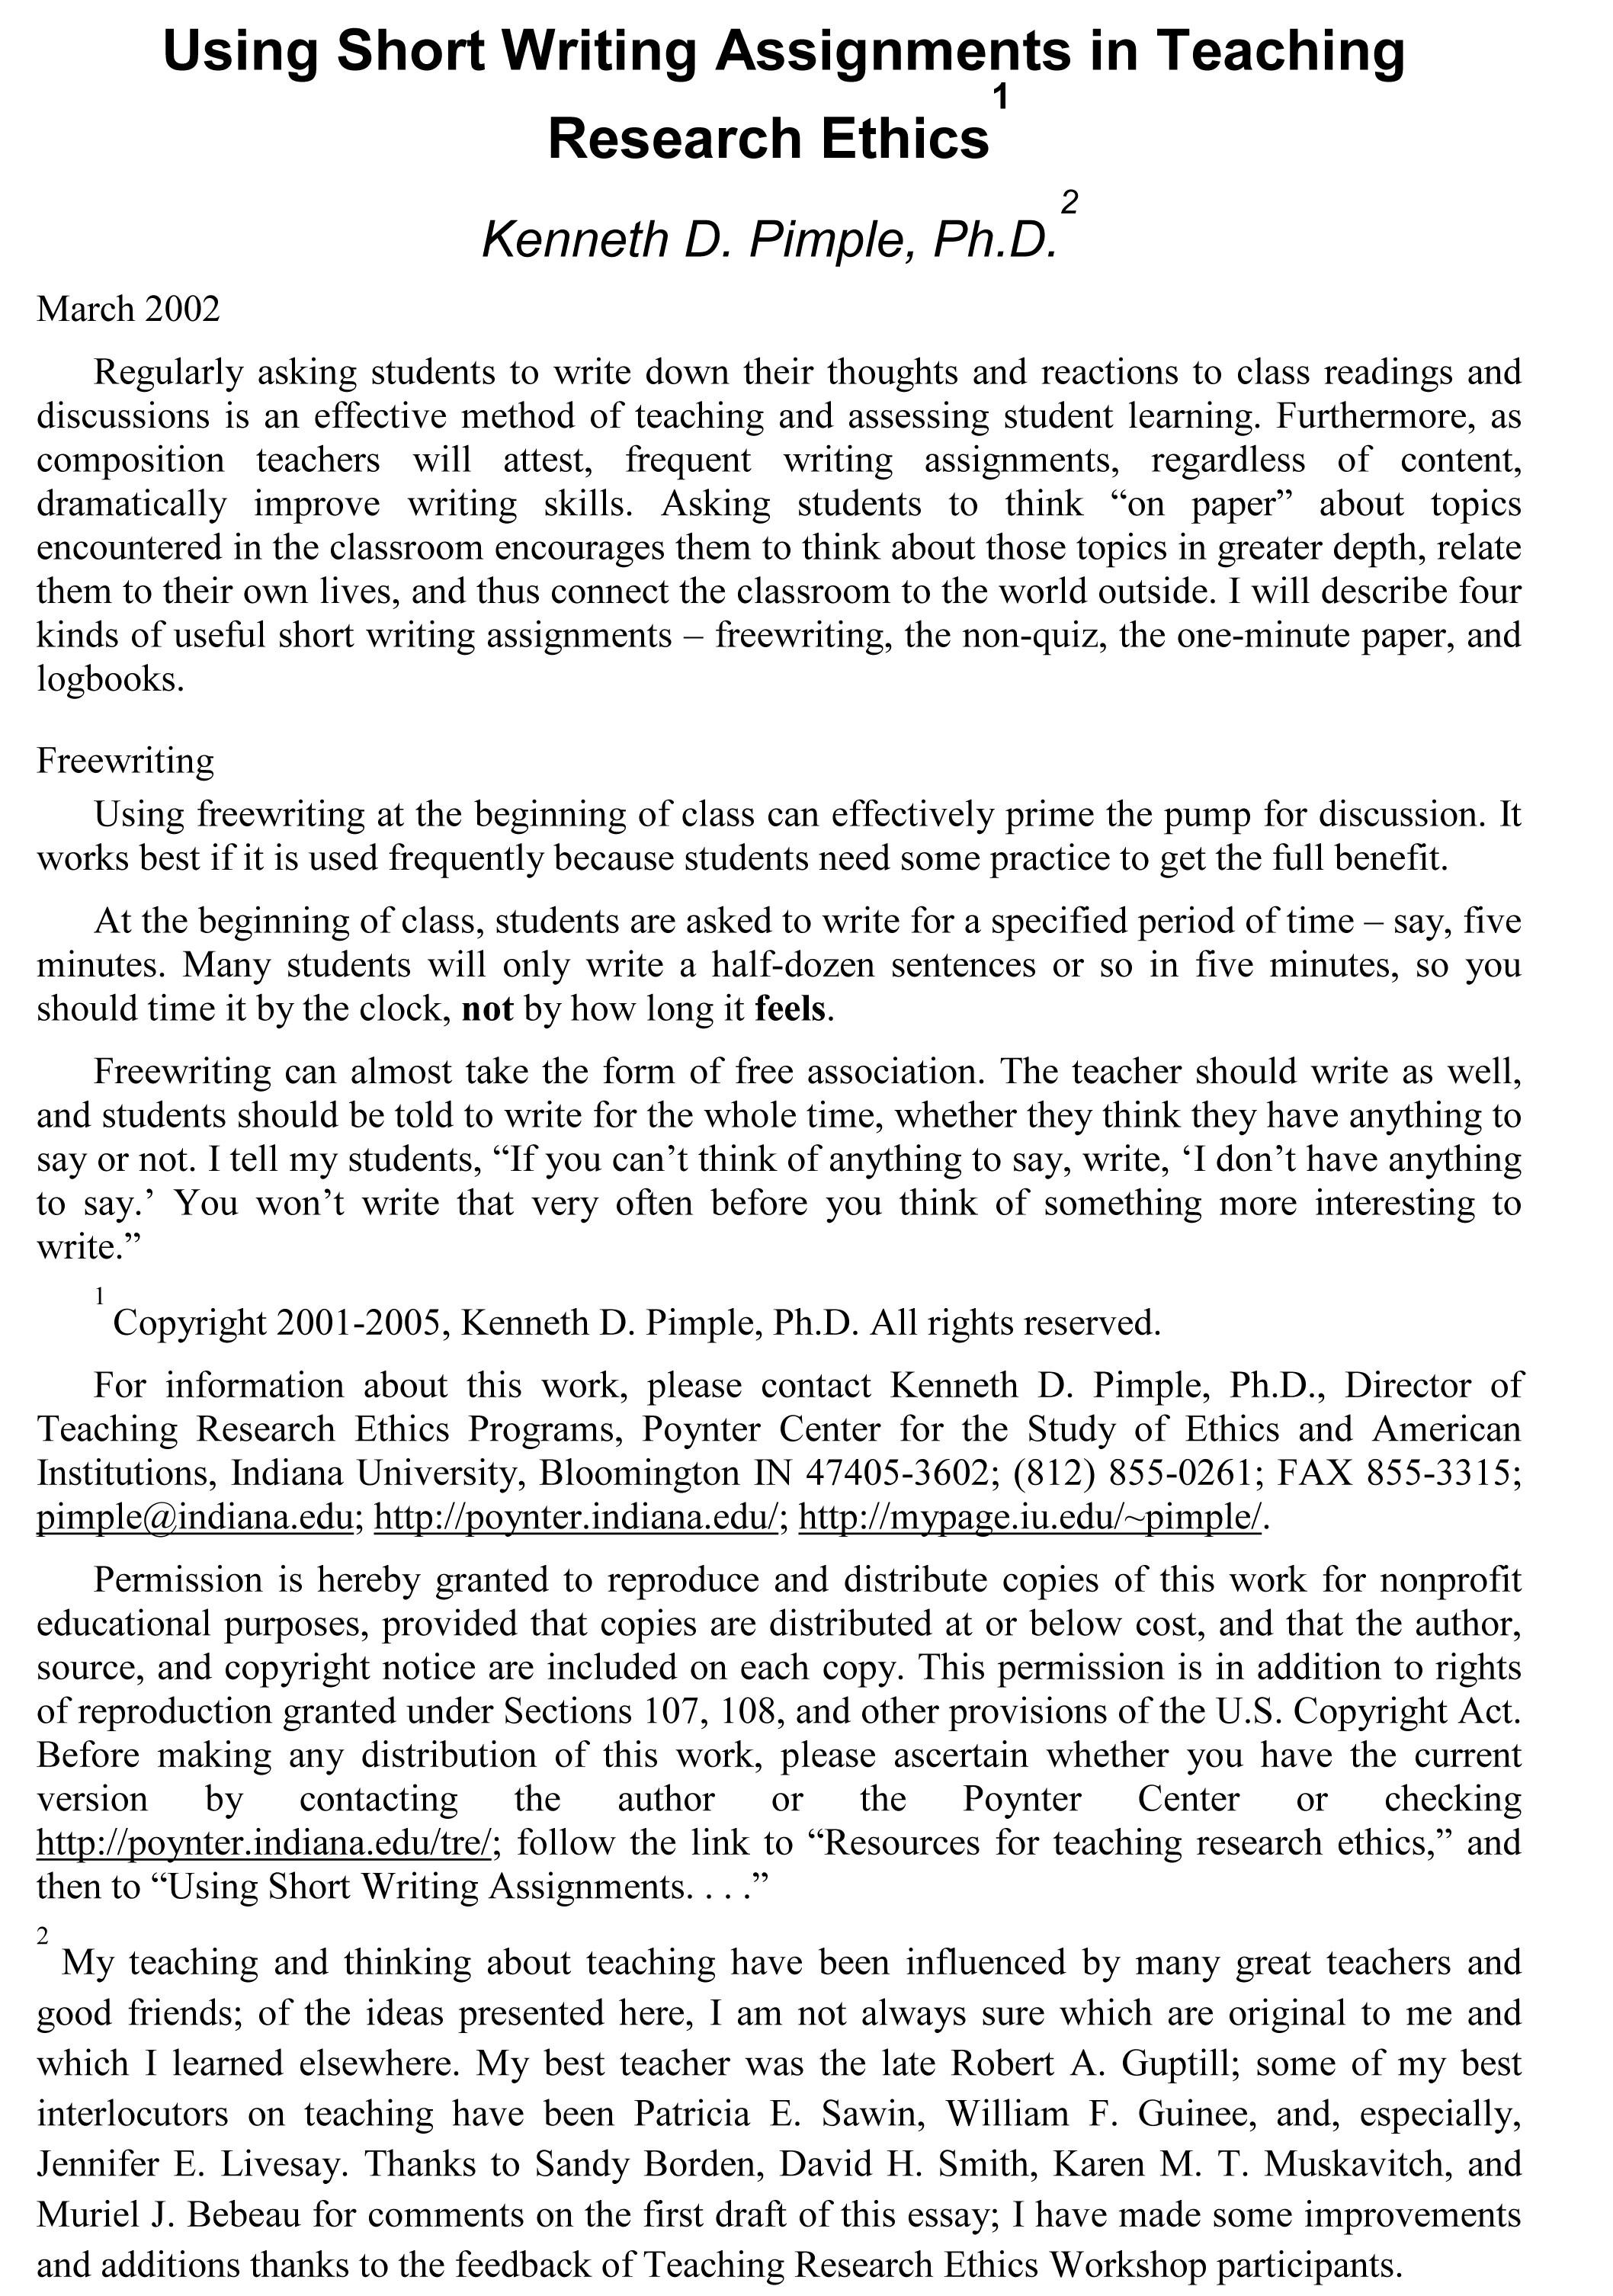 012 Essay Example Sample Teaching Remarkable Diversity Law School Uw Examples Medical Full